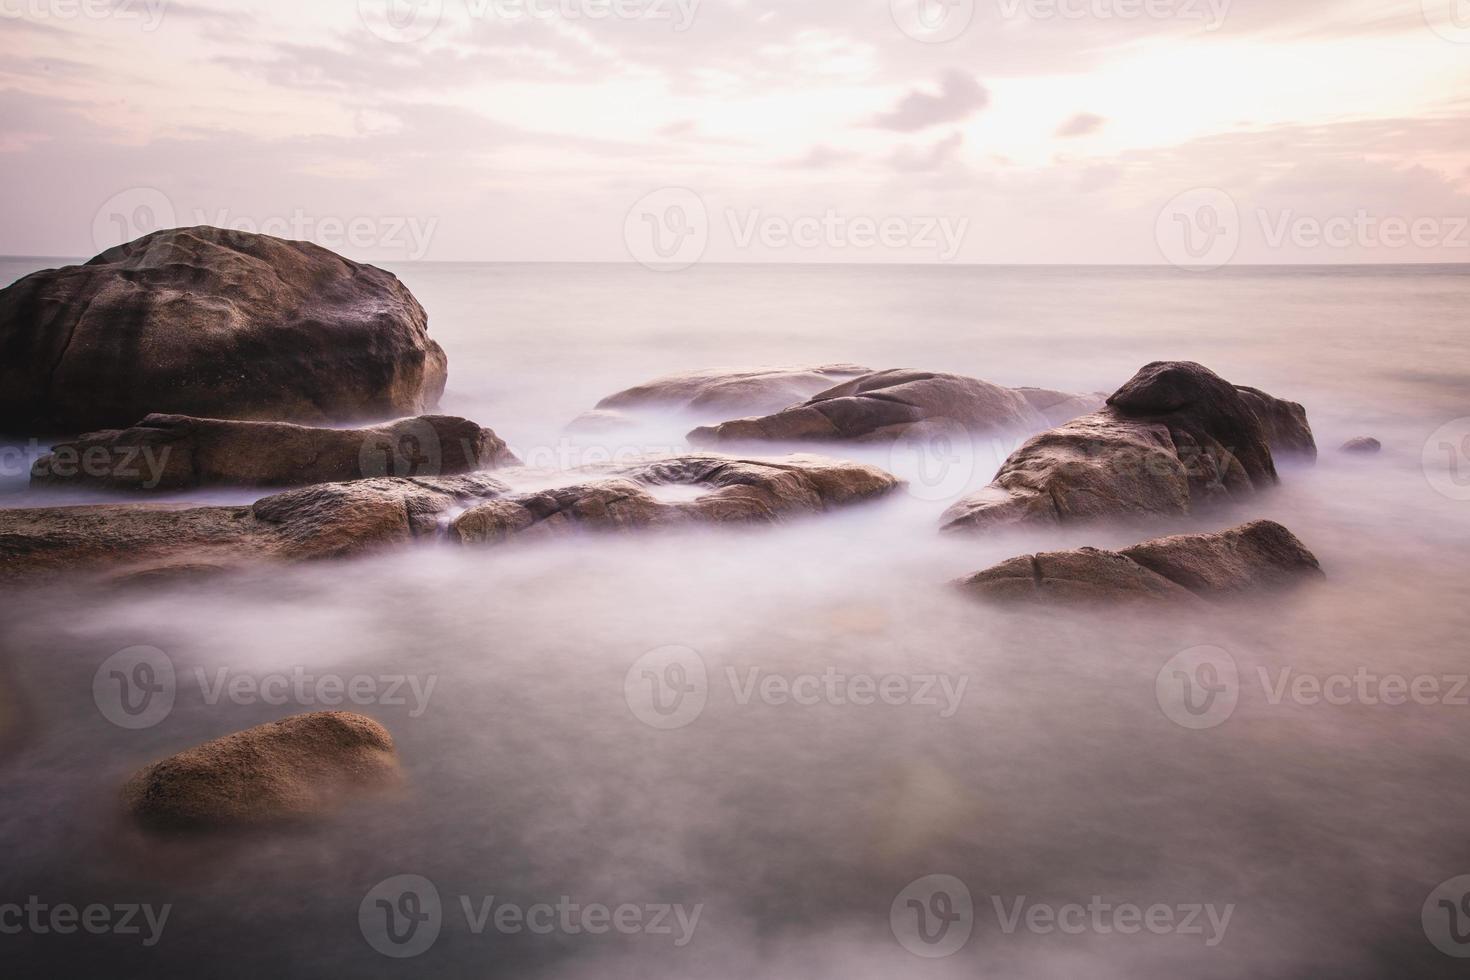 The rocky shore or beach photo